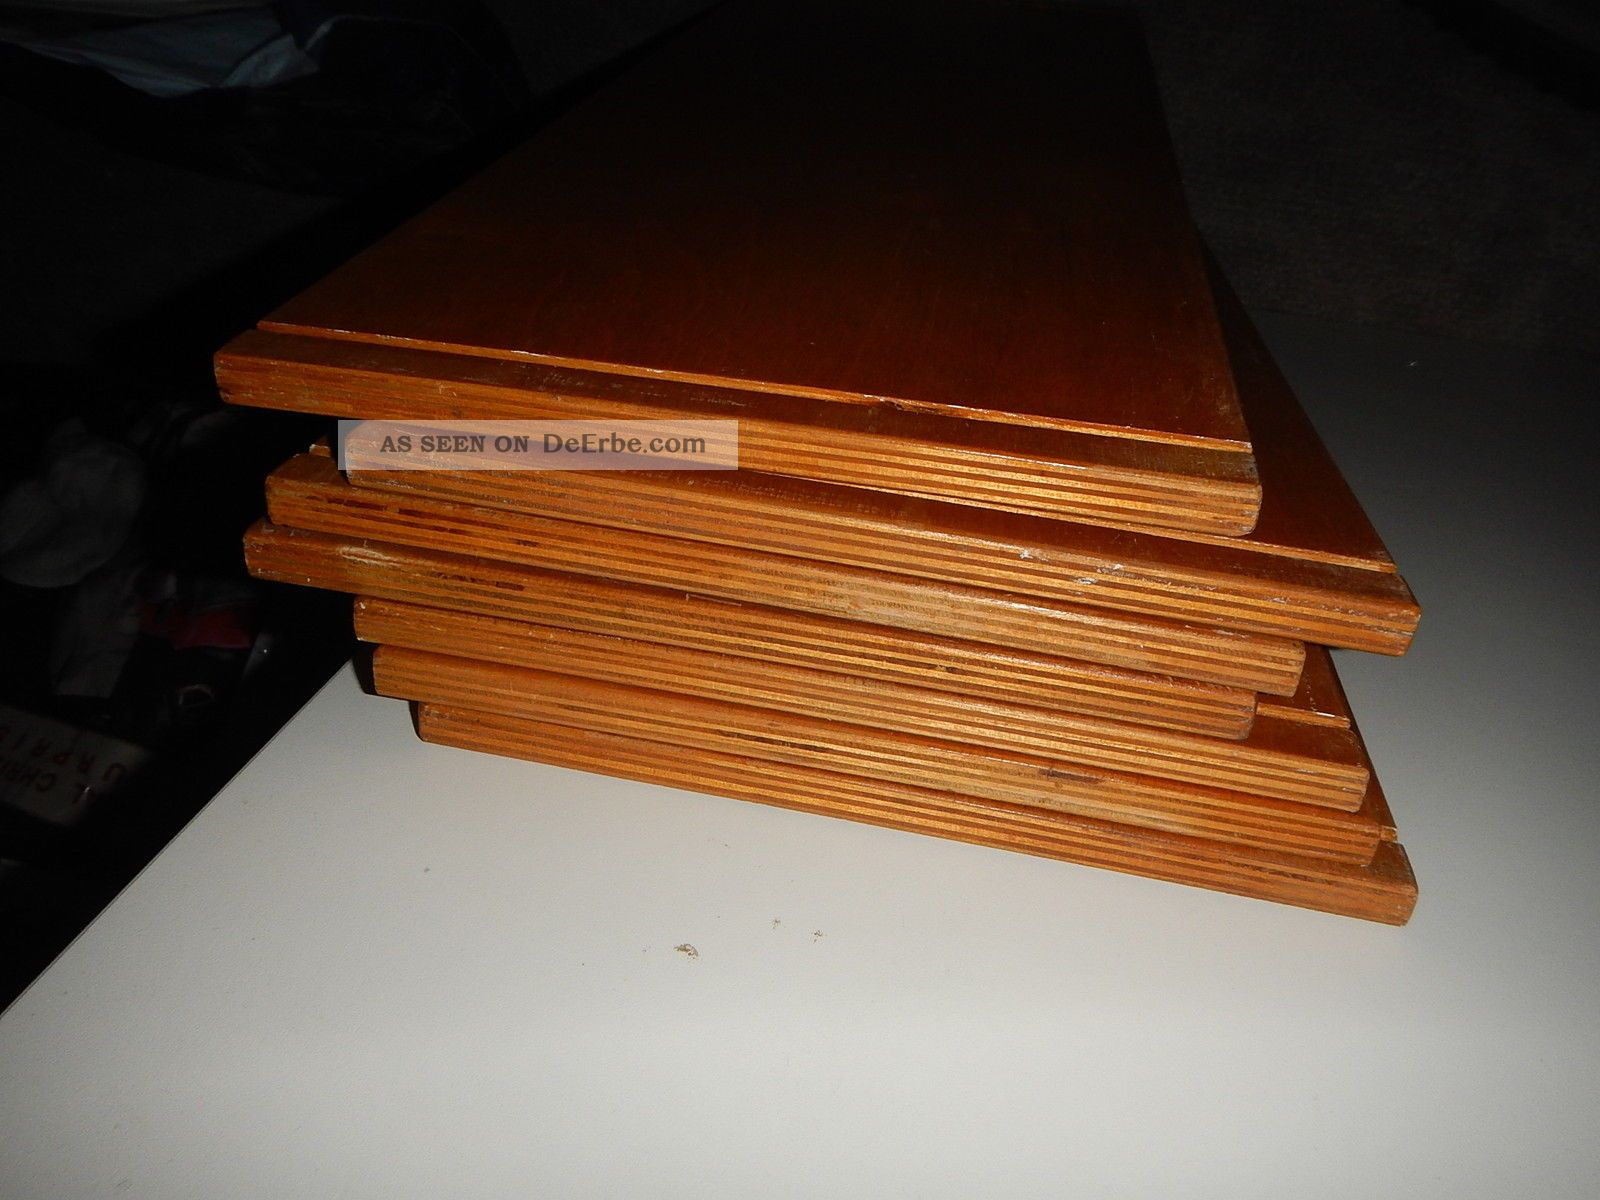 string regal daf r 7x org b den 63cm x 23cm org b den originalzustand. Black Bedroom Furniture Sets. Home Design Ideas